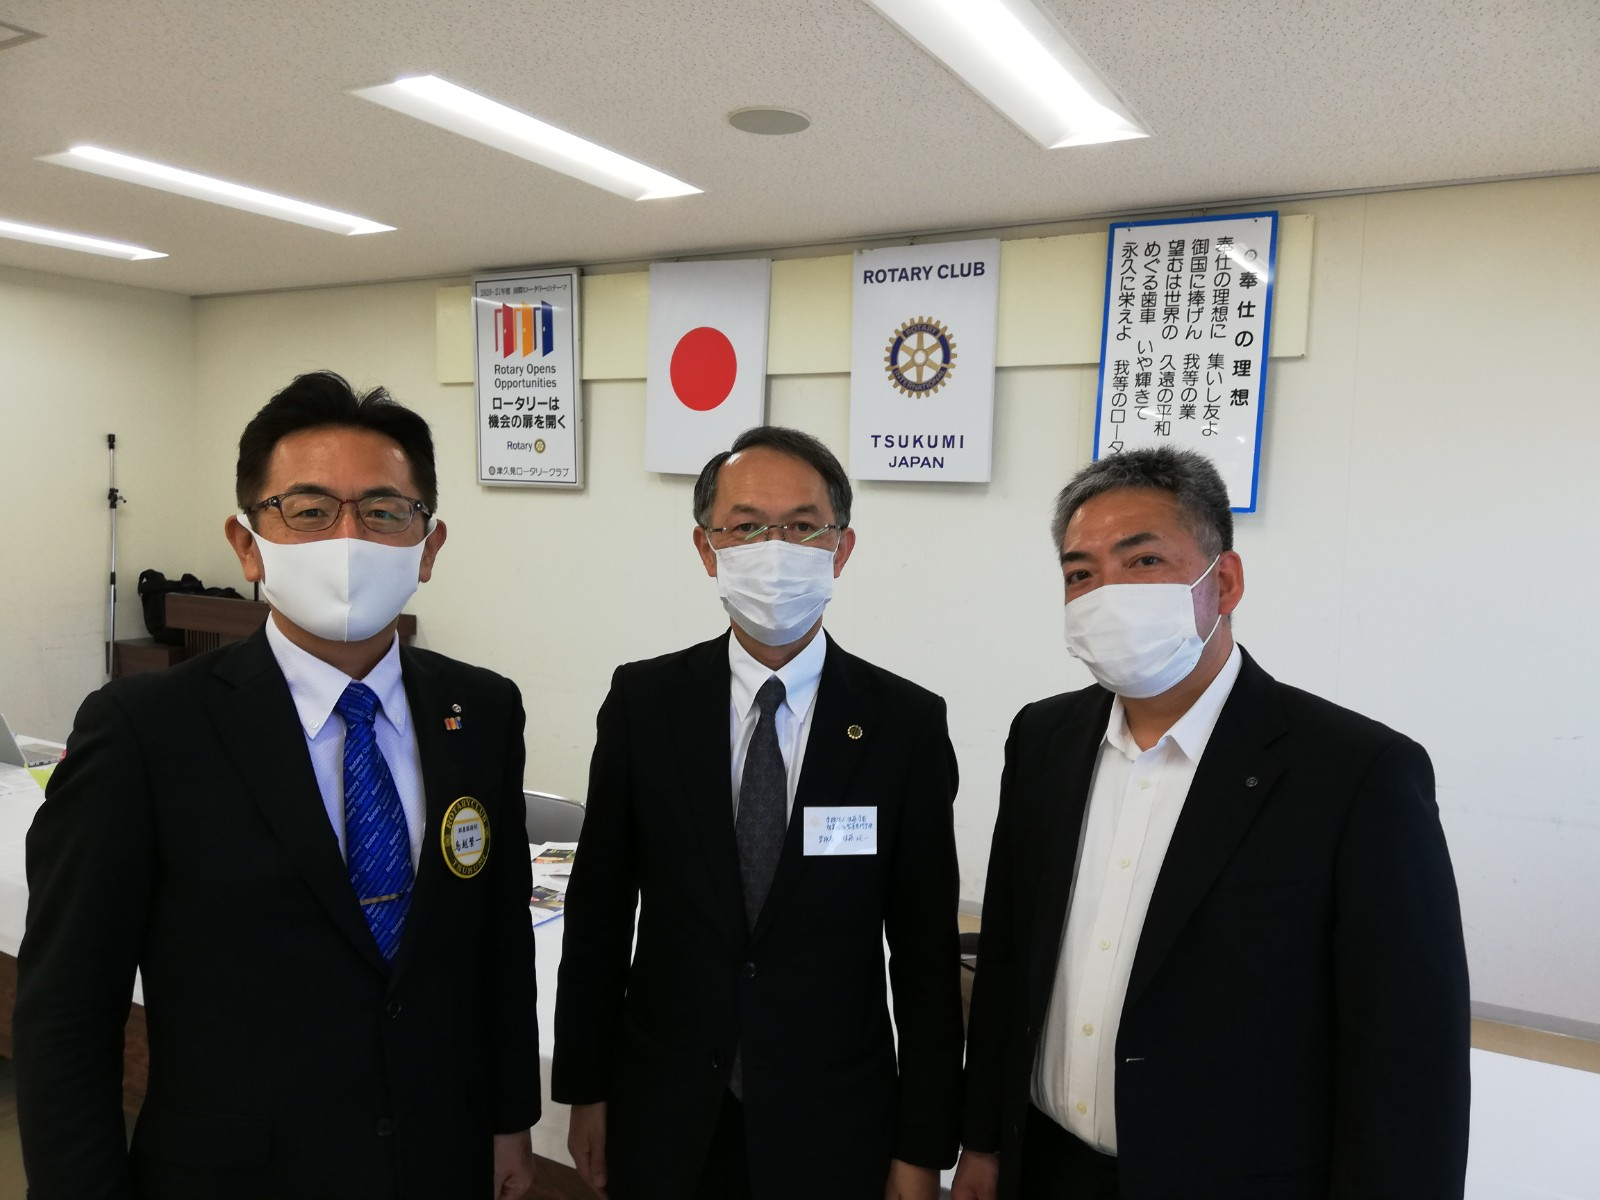 10月6日例会の卓話(津久見RC)